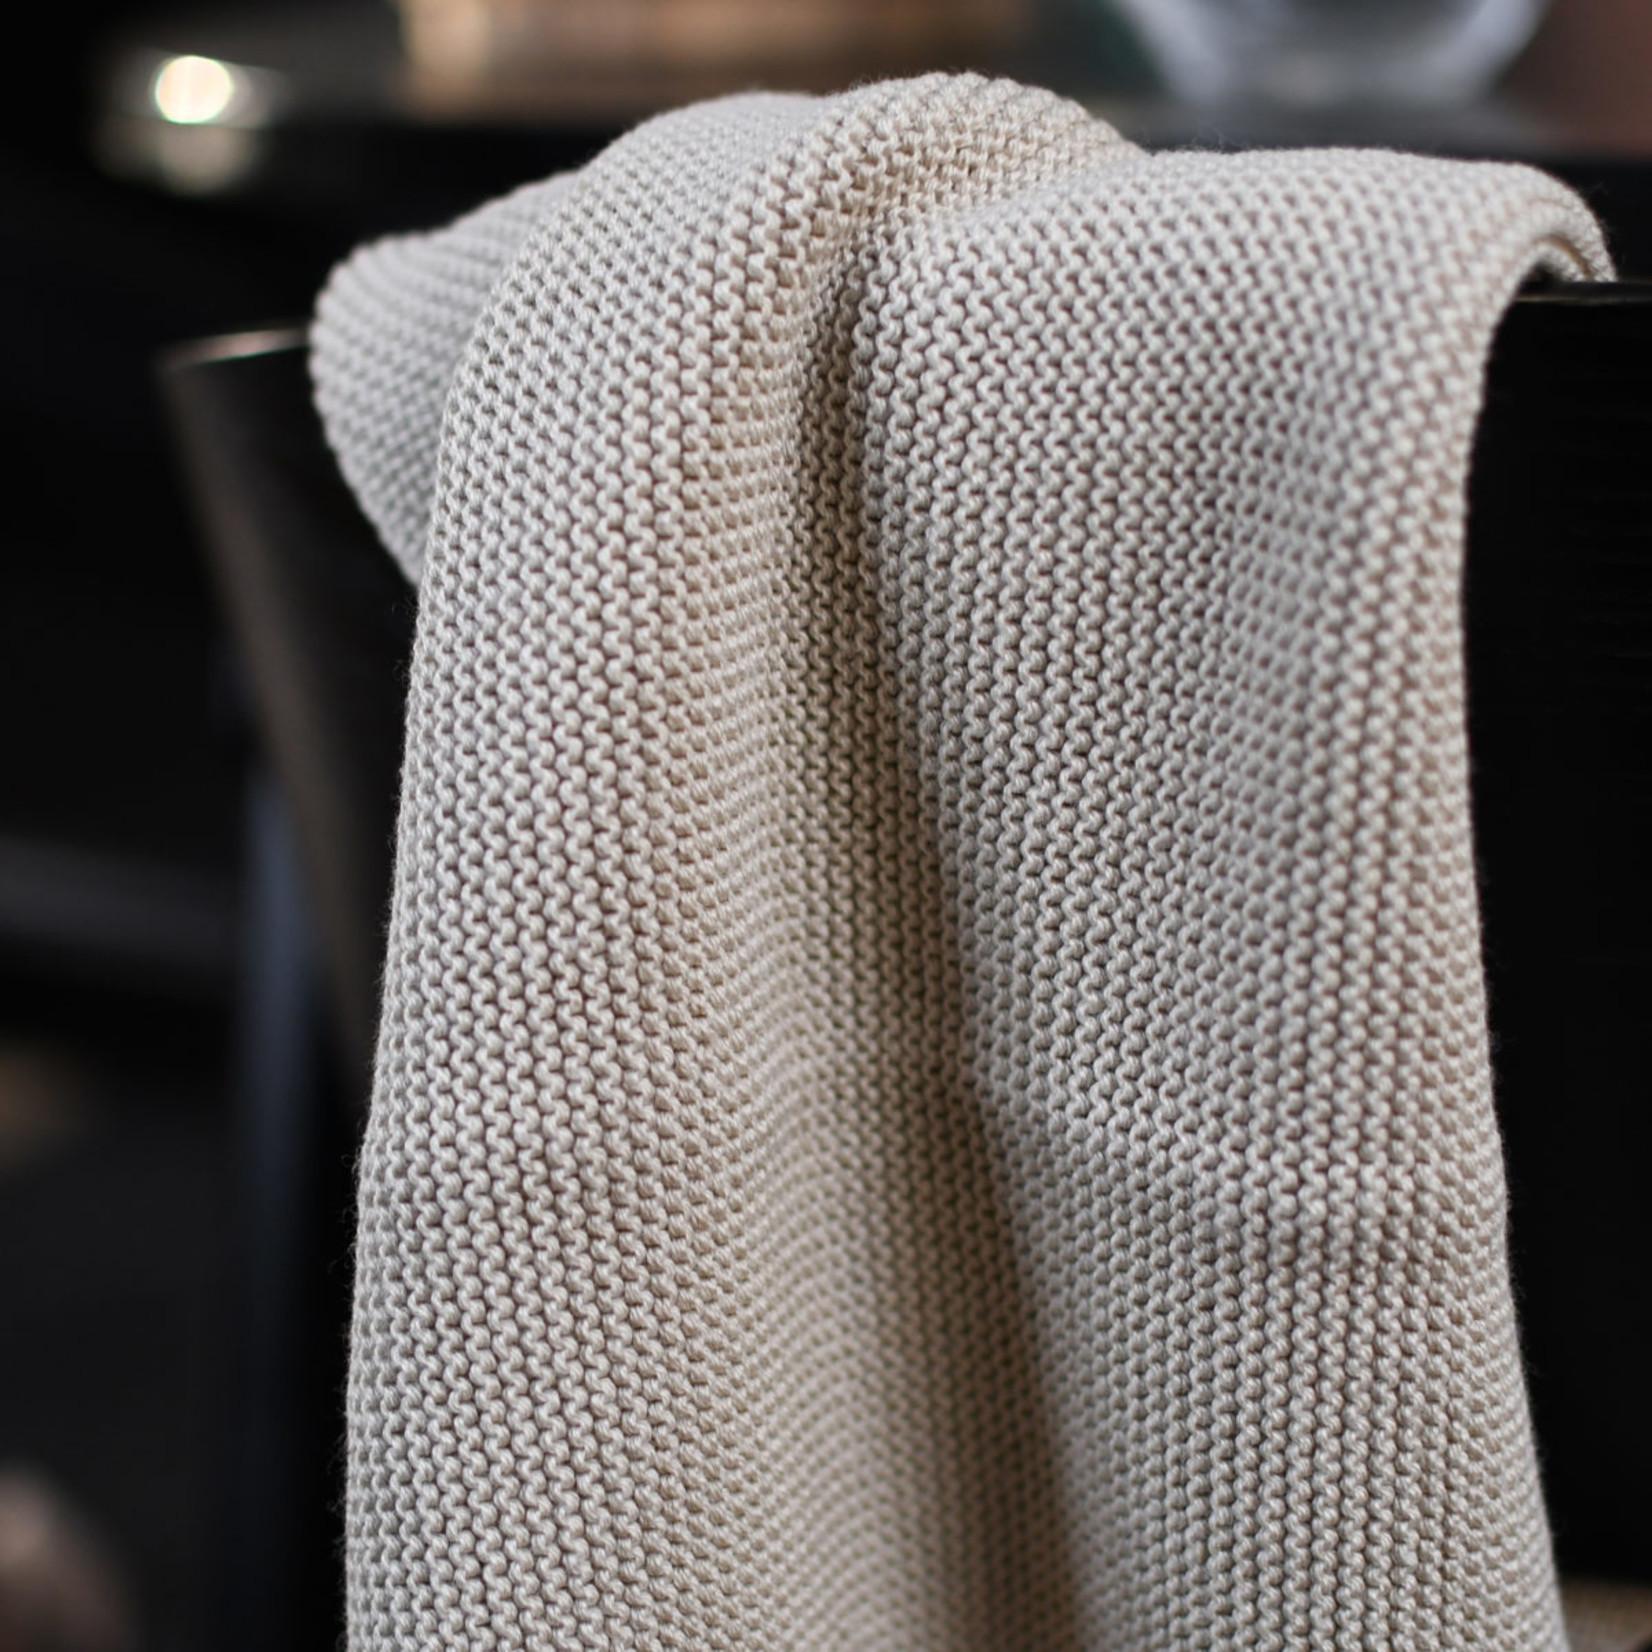 Storefactory  Handtuch Tullebo greige